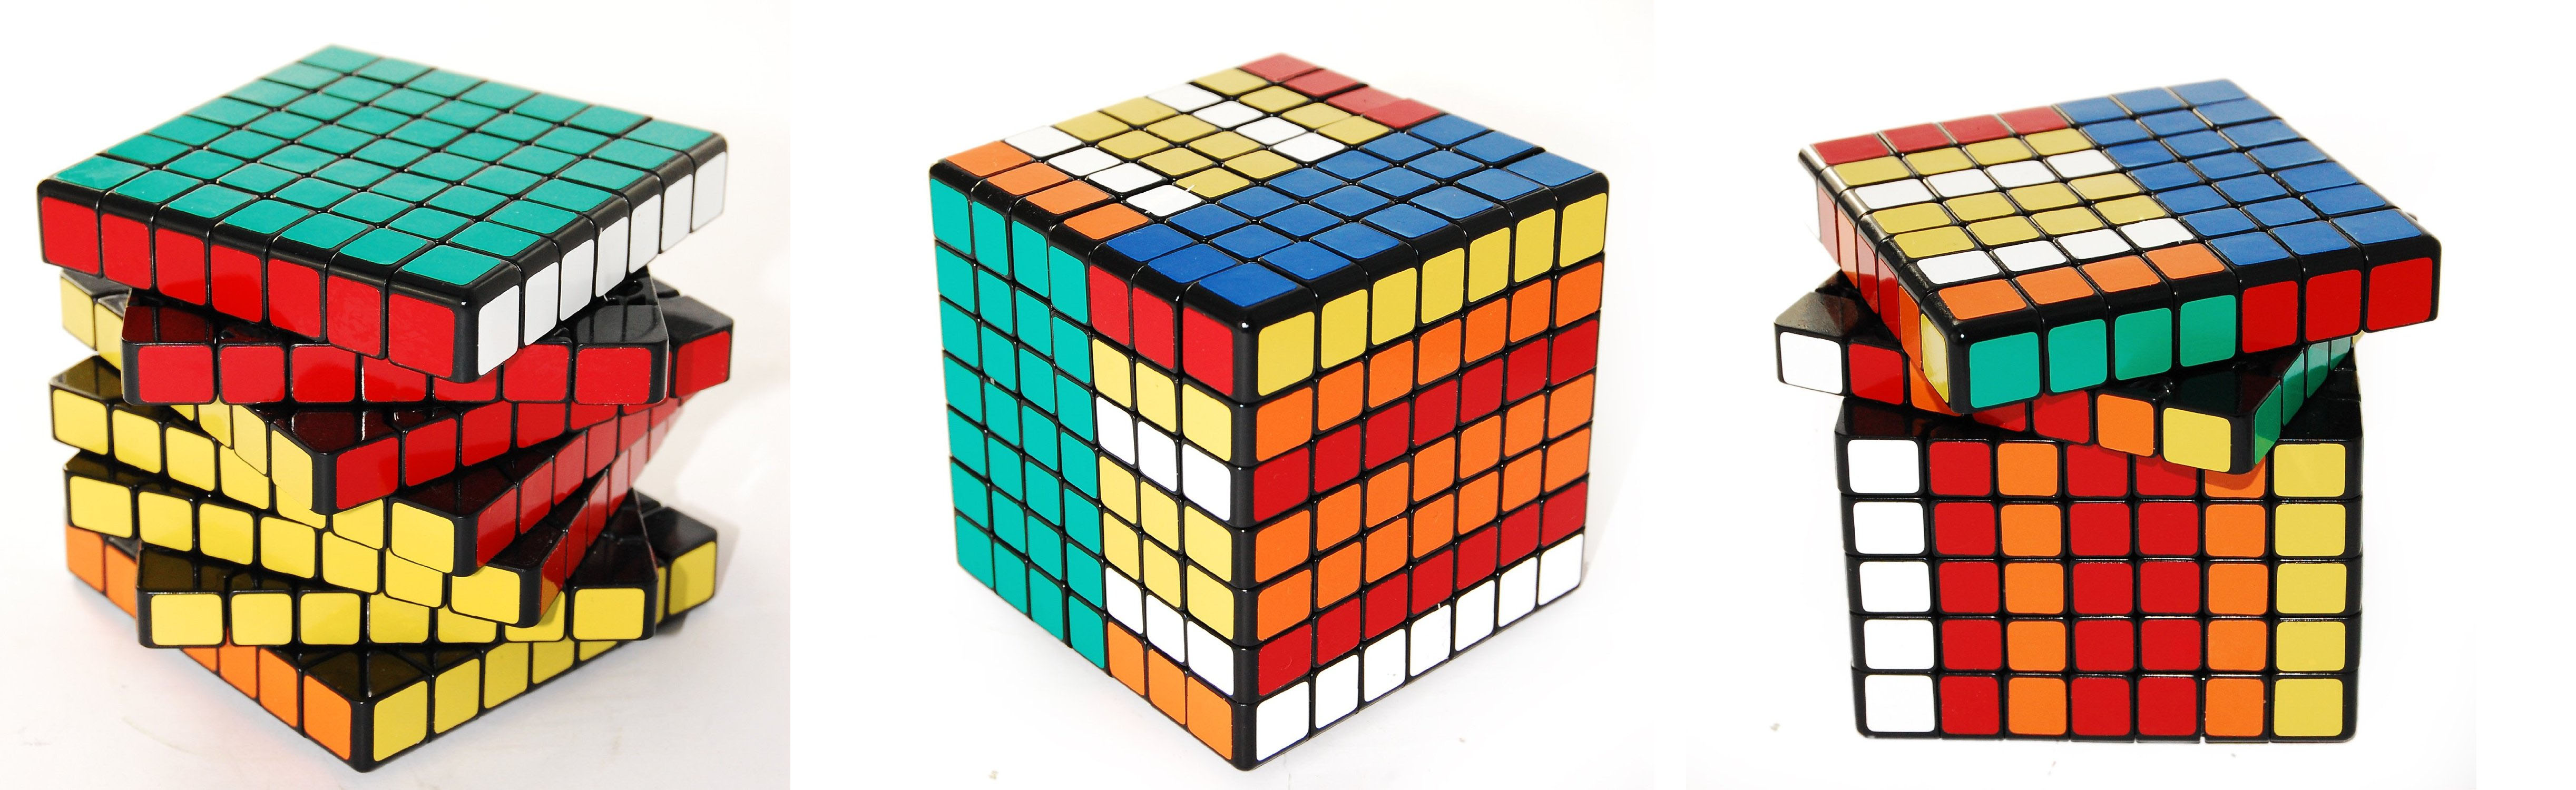 7X7 Rubik's Cube Type Puzzles